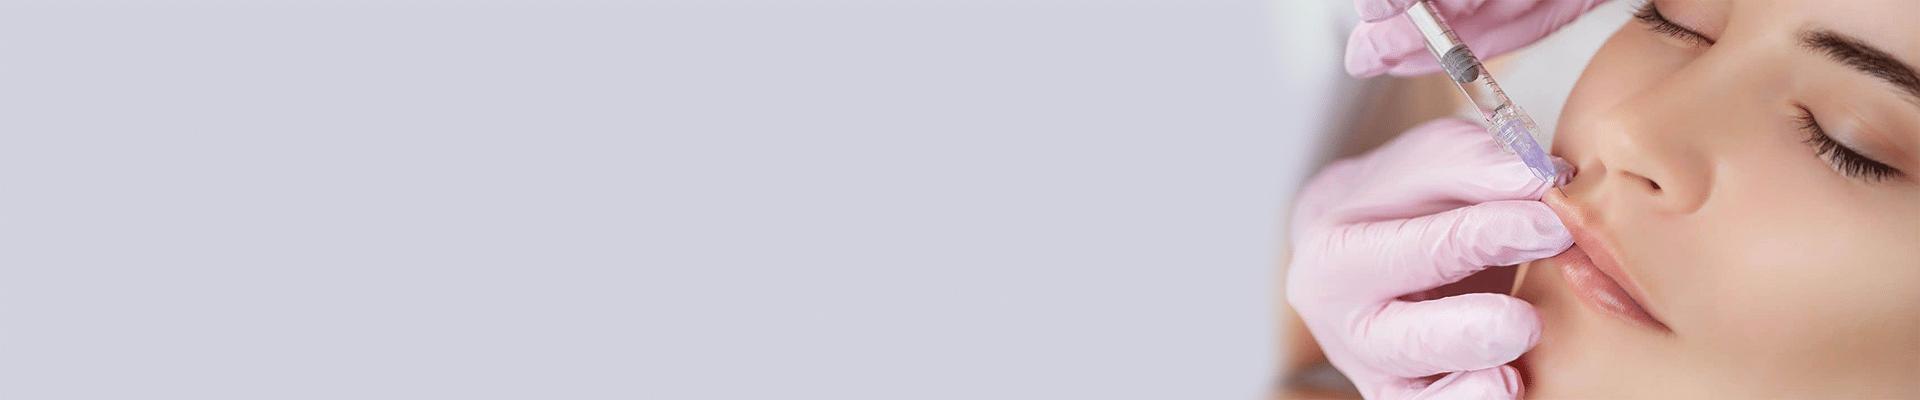 [:fr]comblement et médecine anti-age Nabeul[:ar]ملء التجاعيد و طب مكافحة الشيخوخة في نابل [:]